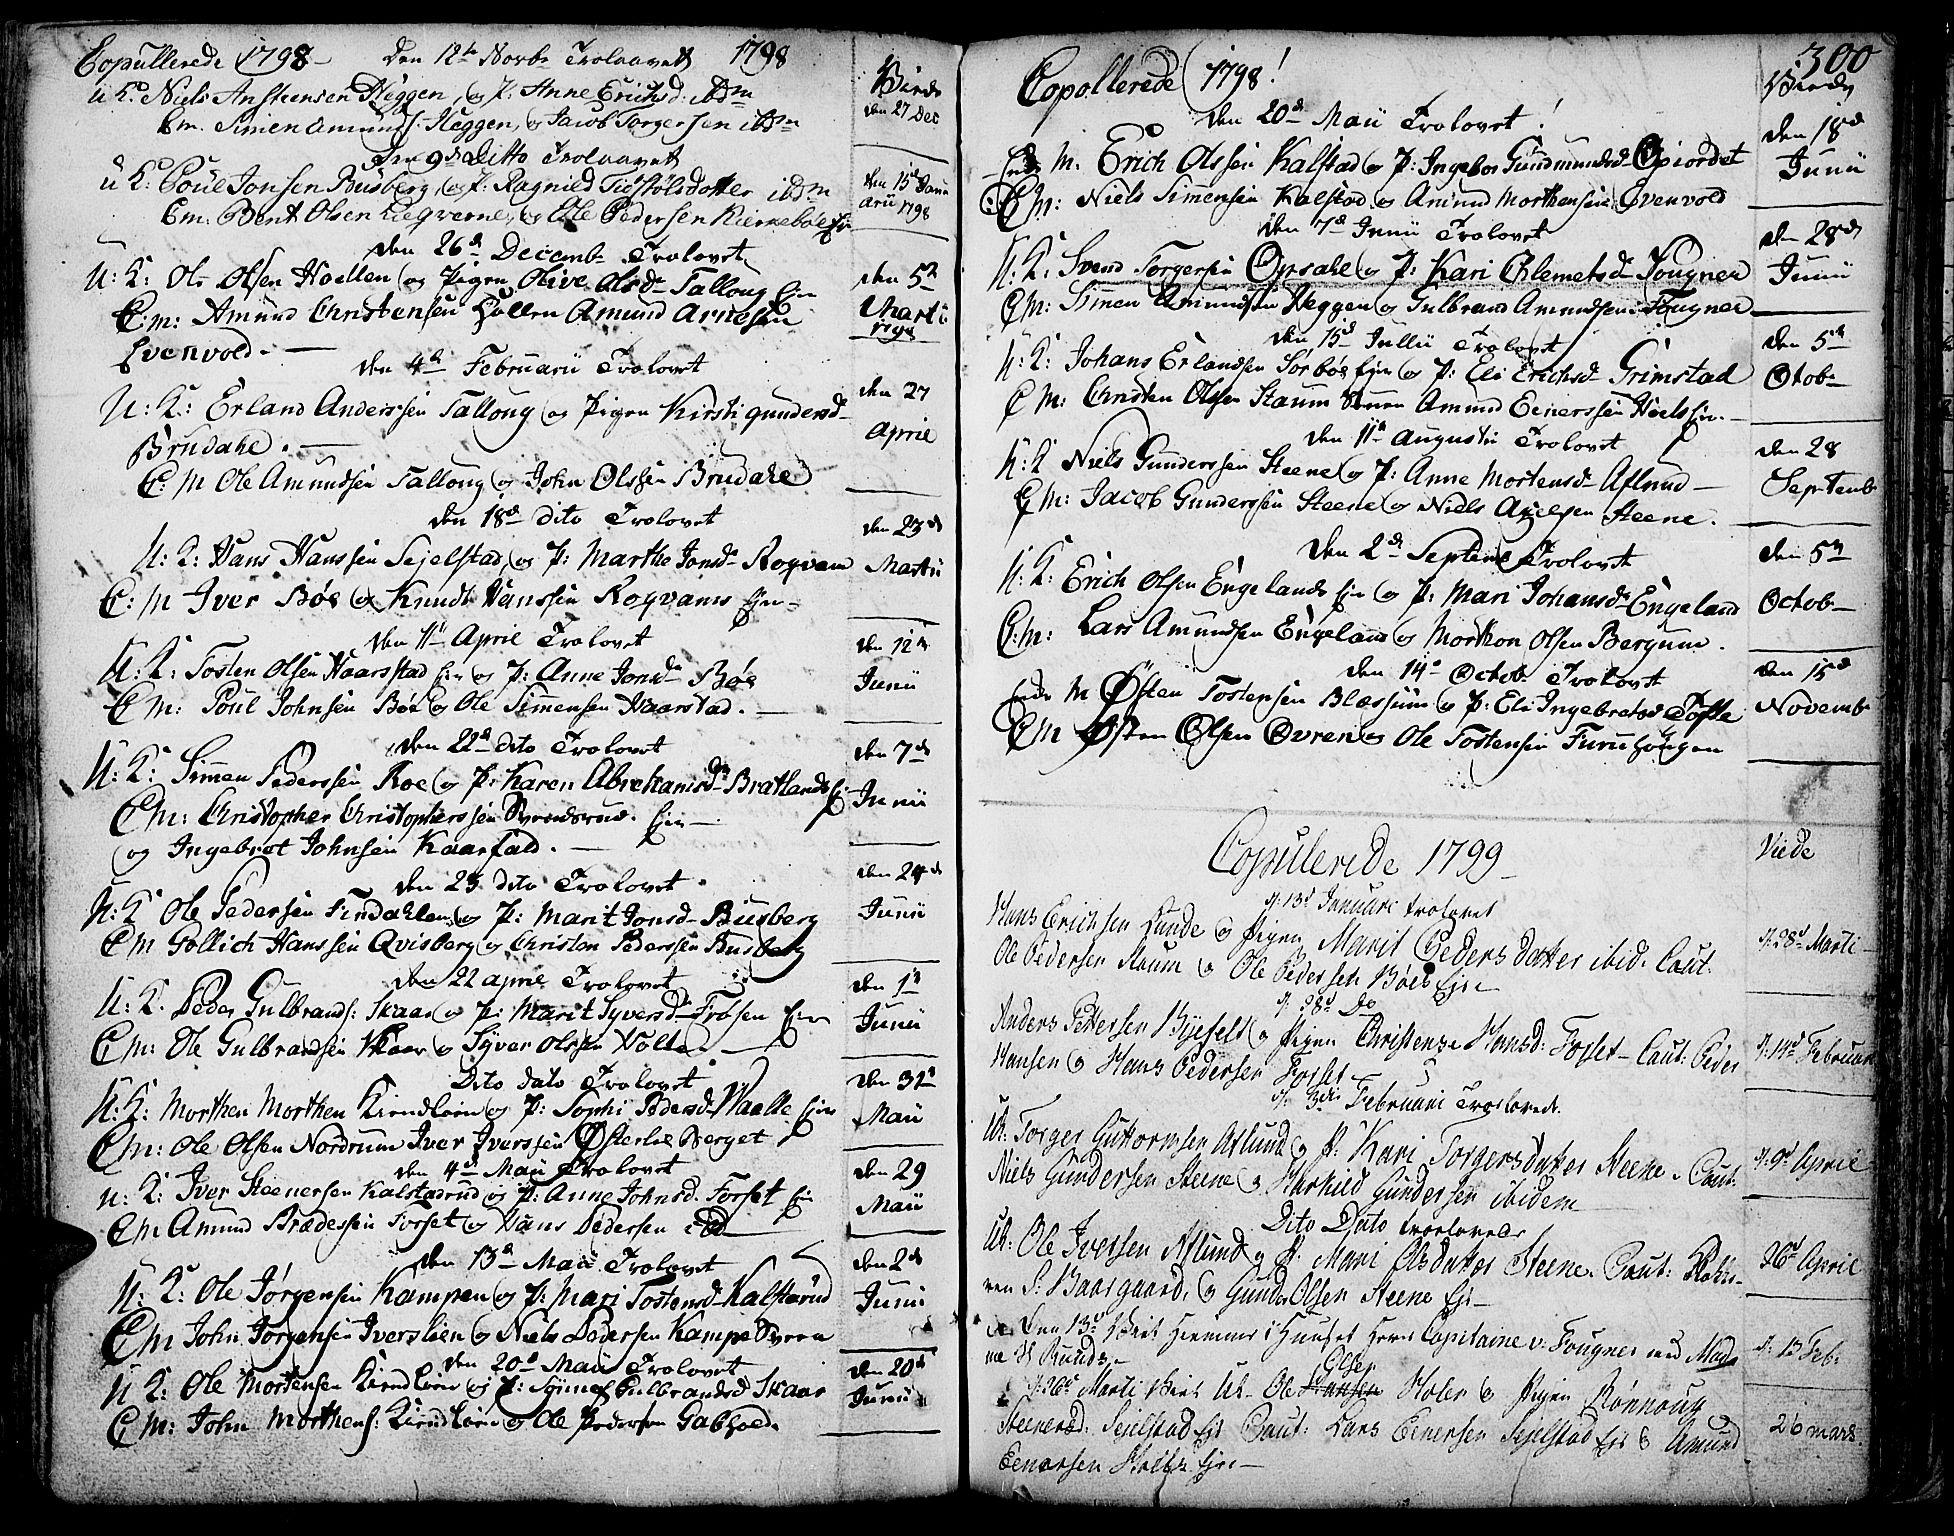 SAH, Gausdal prestekontor, Ministerialbok nr. 3, 1758-1809, s. 300